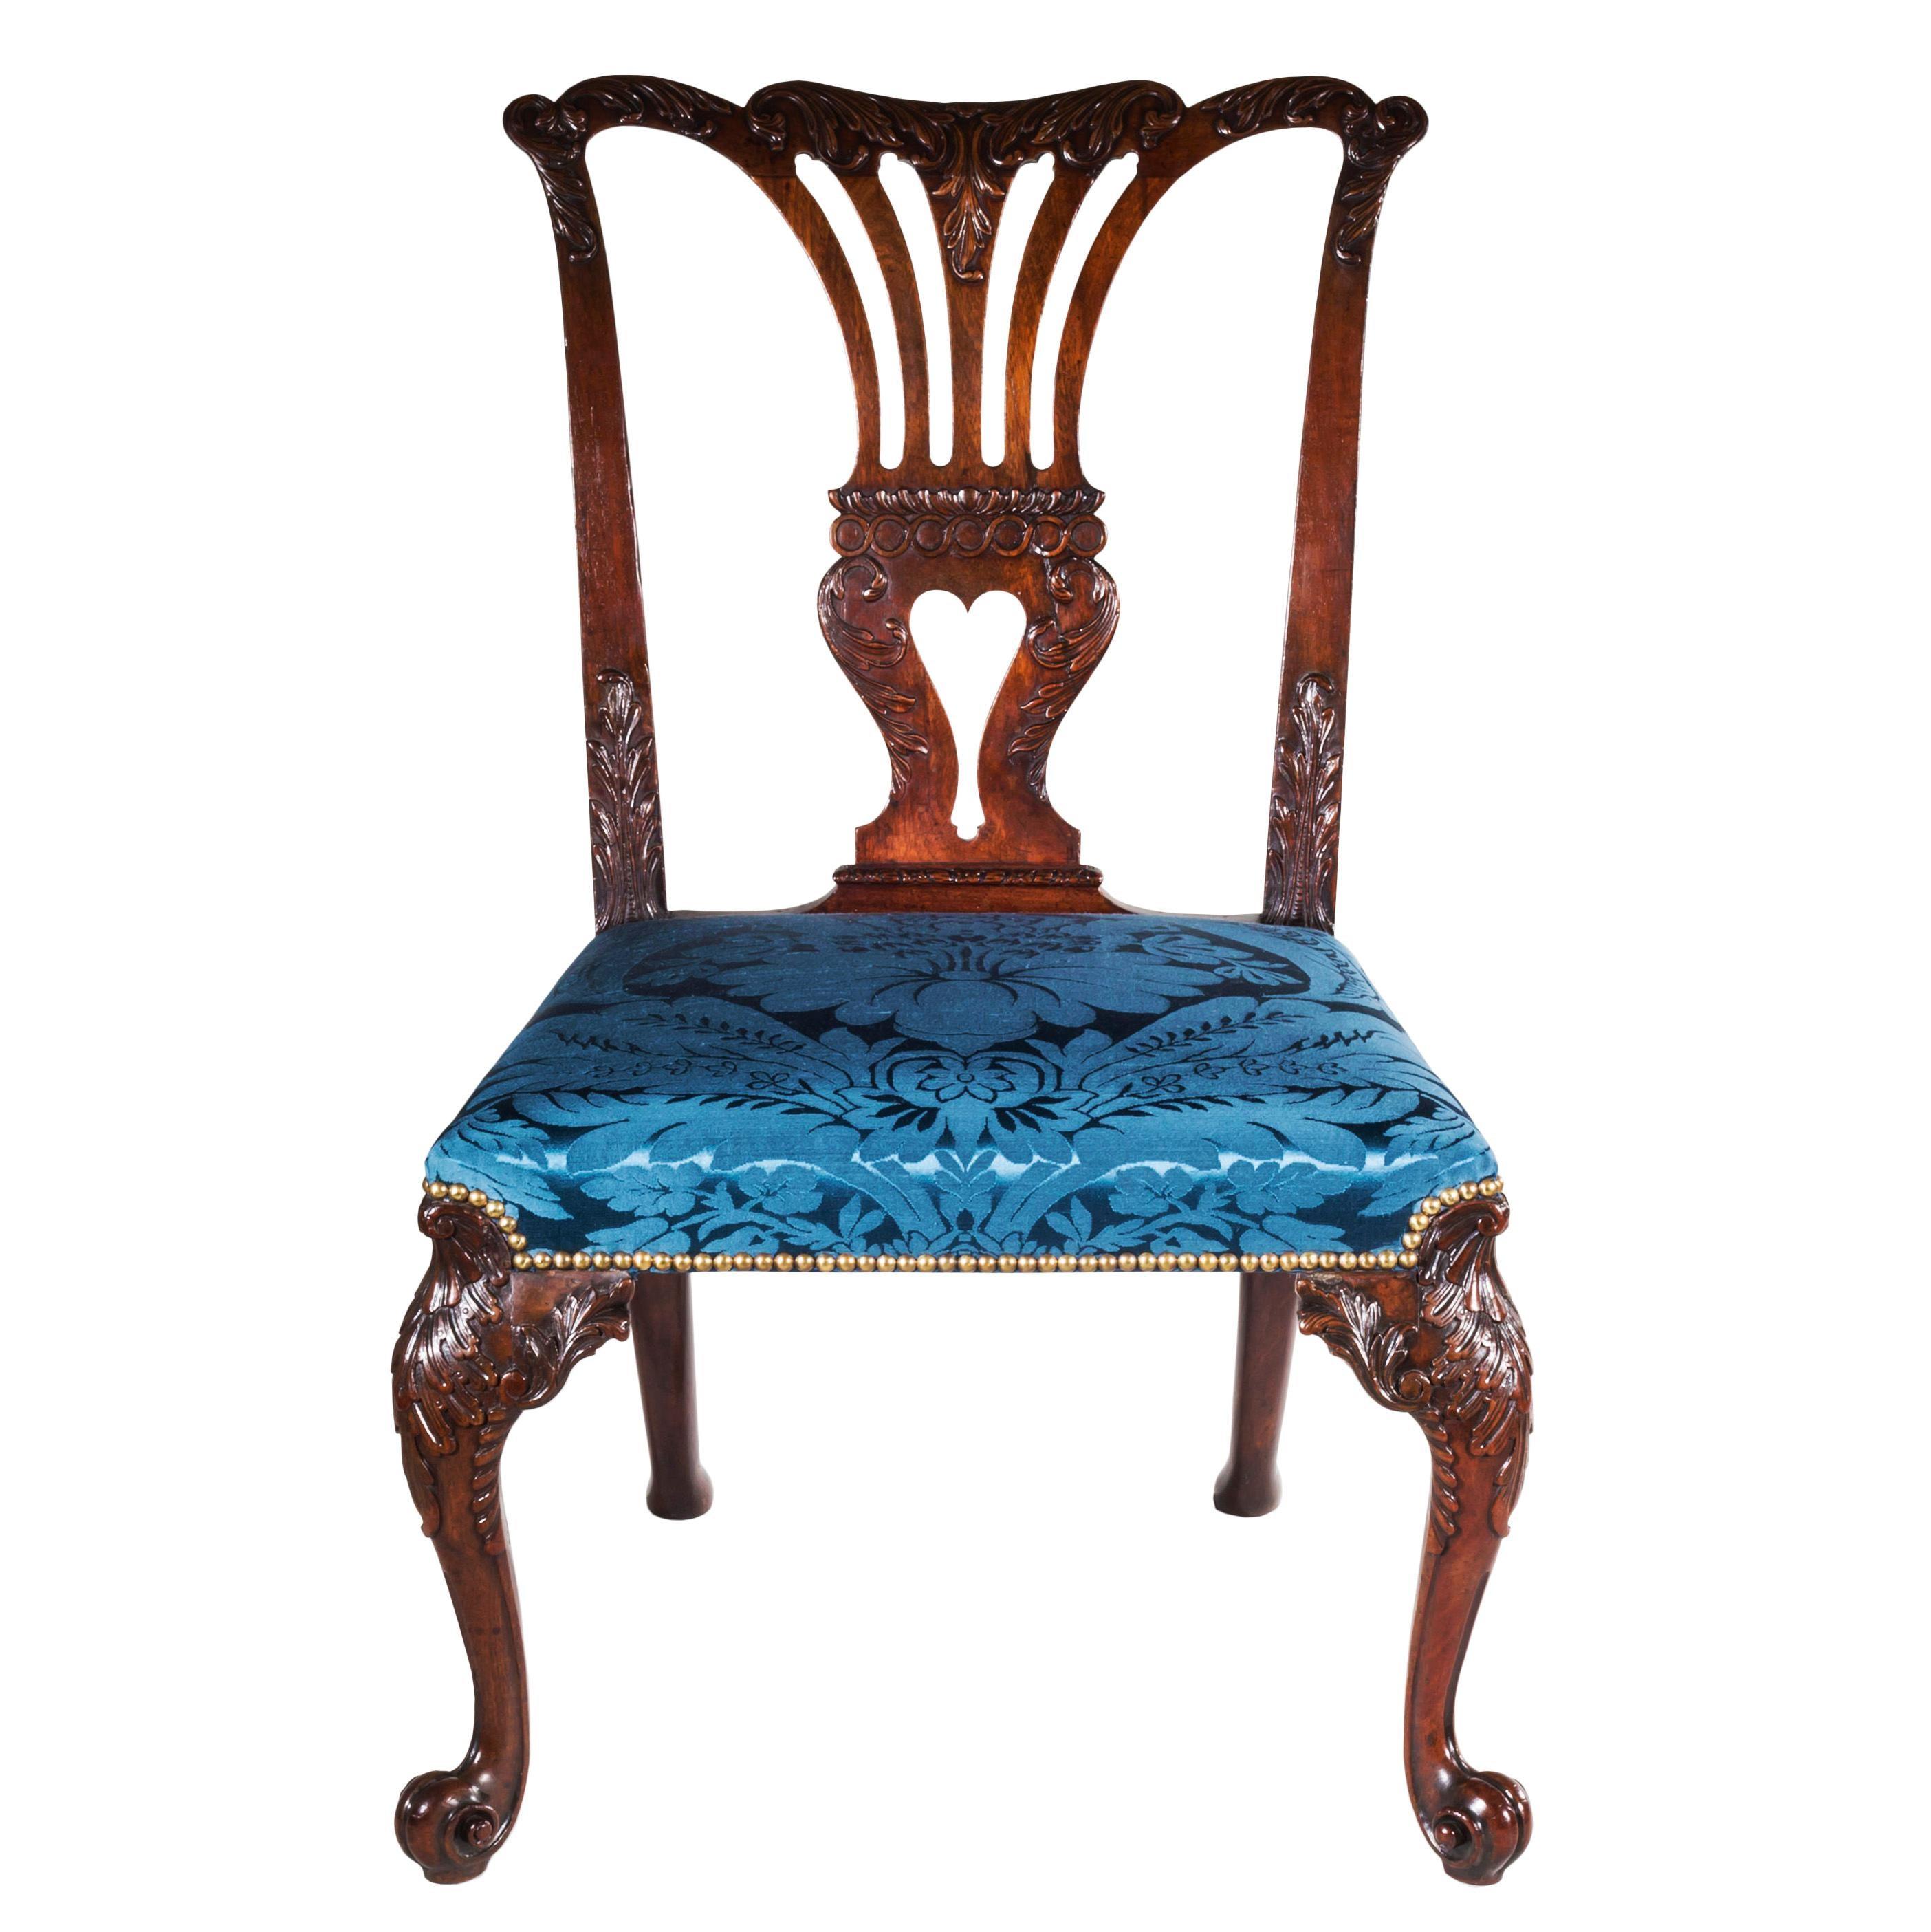 Chippendale Rococo Chair Attributed To Vile U0026 Cobb, English, Circa 1755